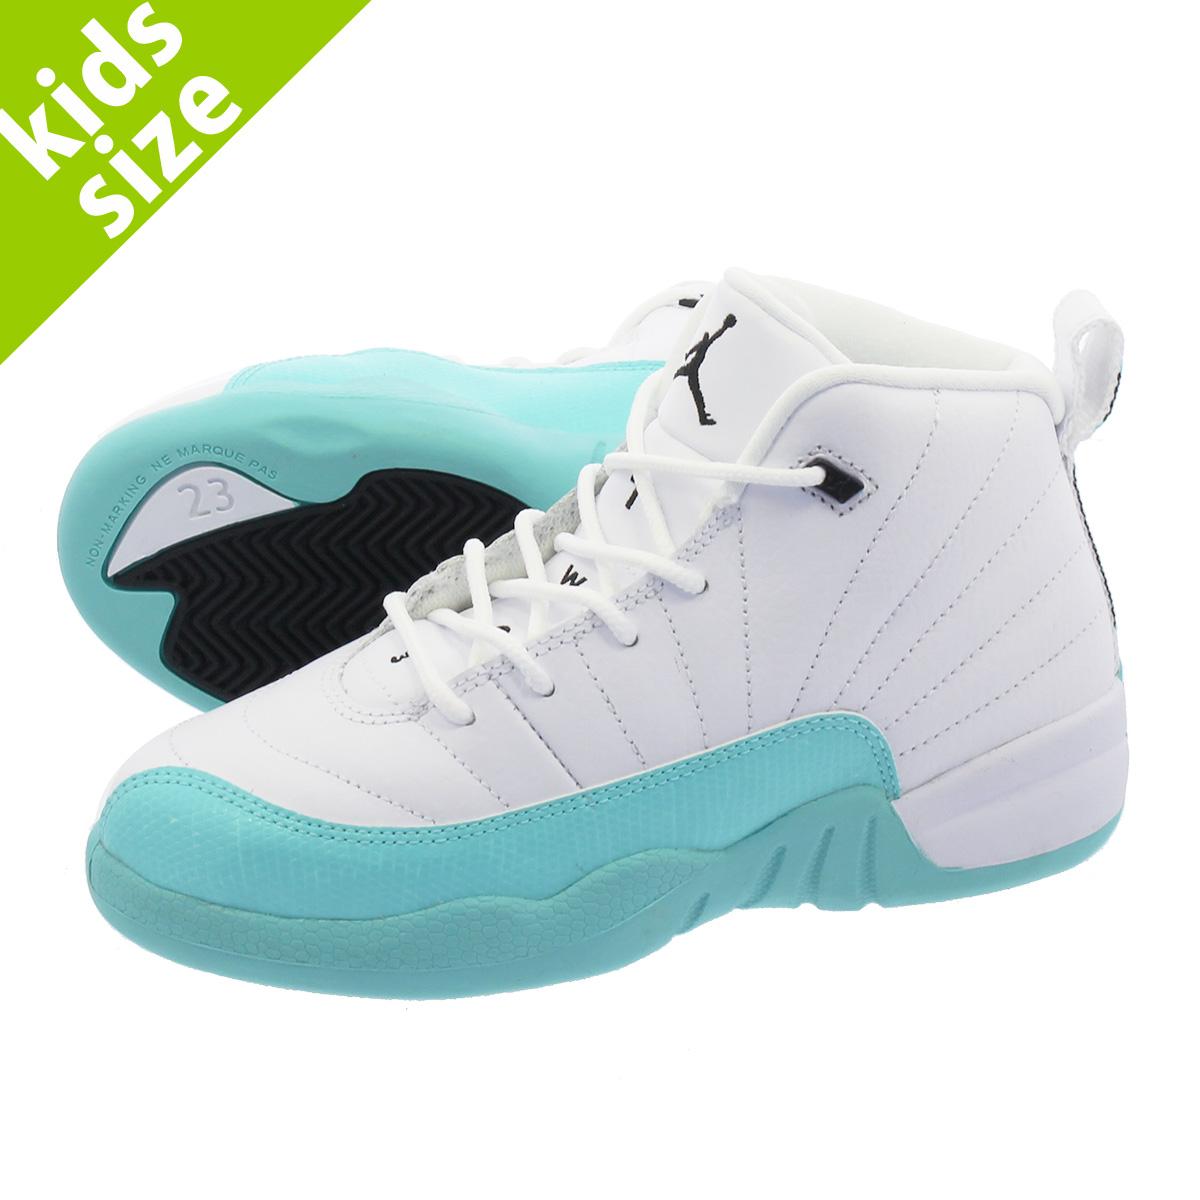 96f61dbebb6b NIKE AIR JORDAN 12 RETRO PS Nike Air Jordan 12 nostalgic PS WHITE LIGHT AQUA BLACK  510